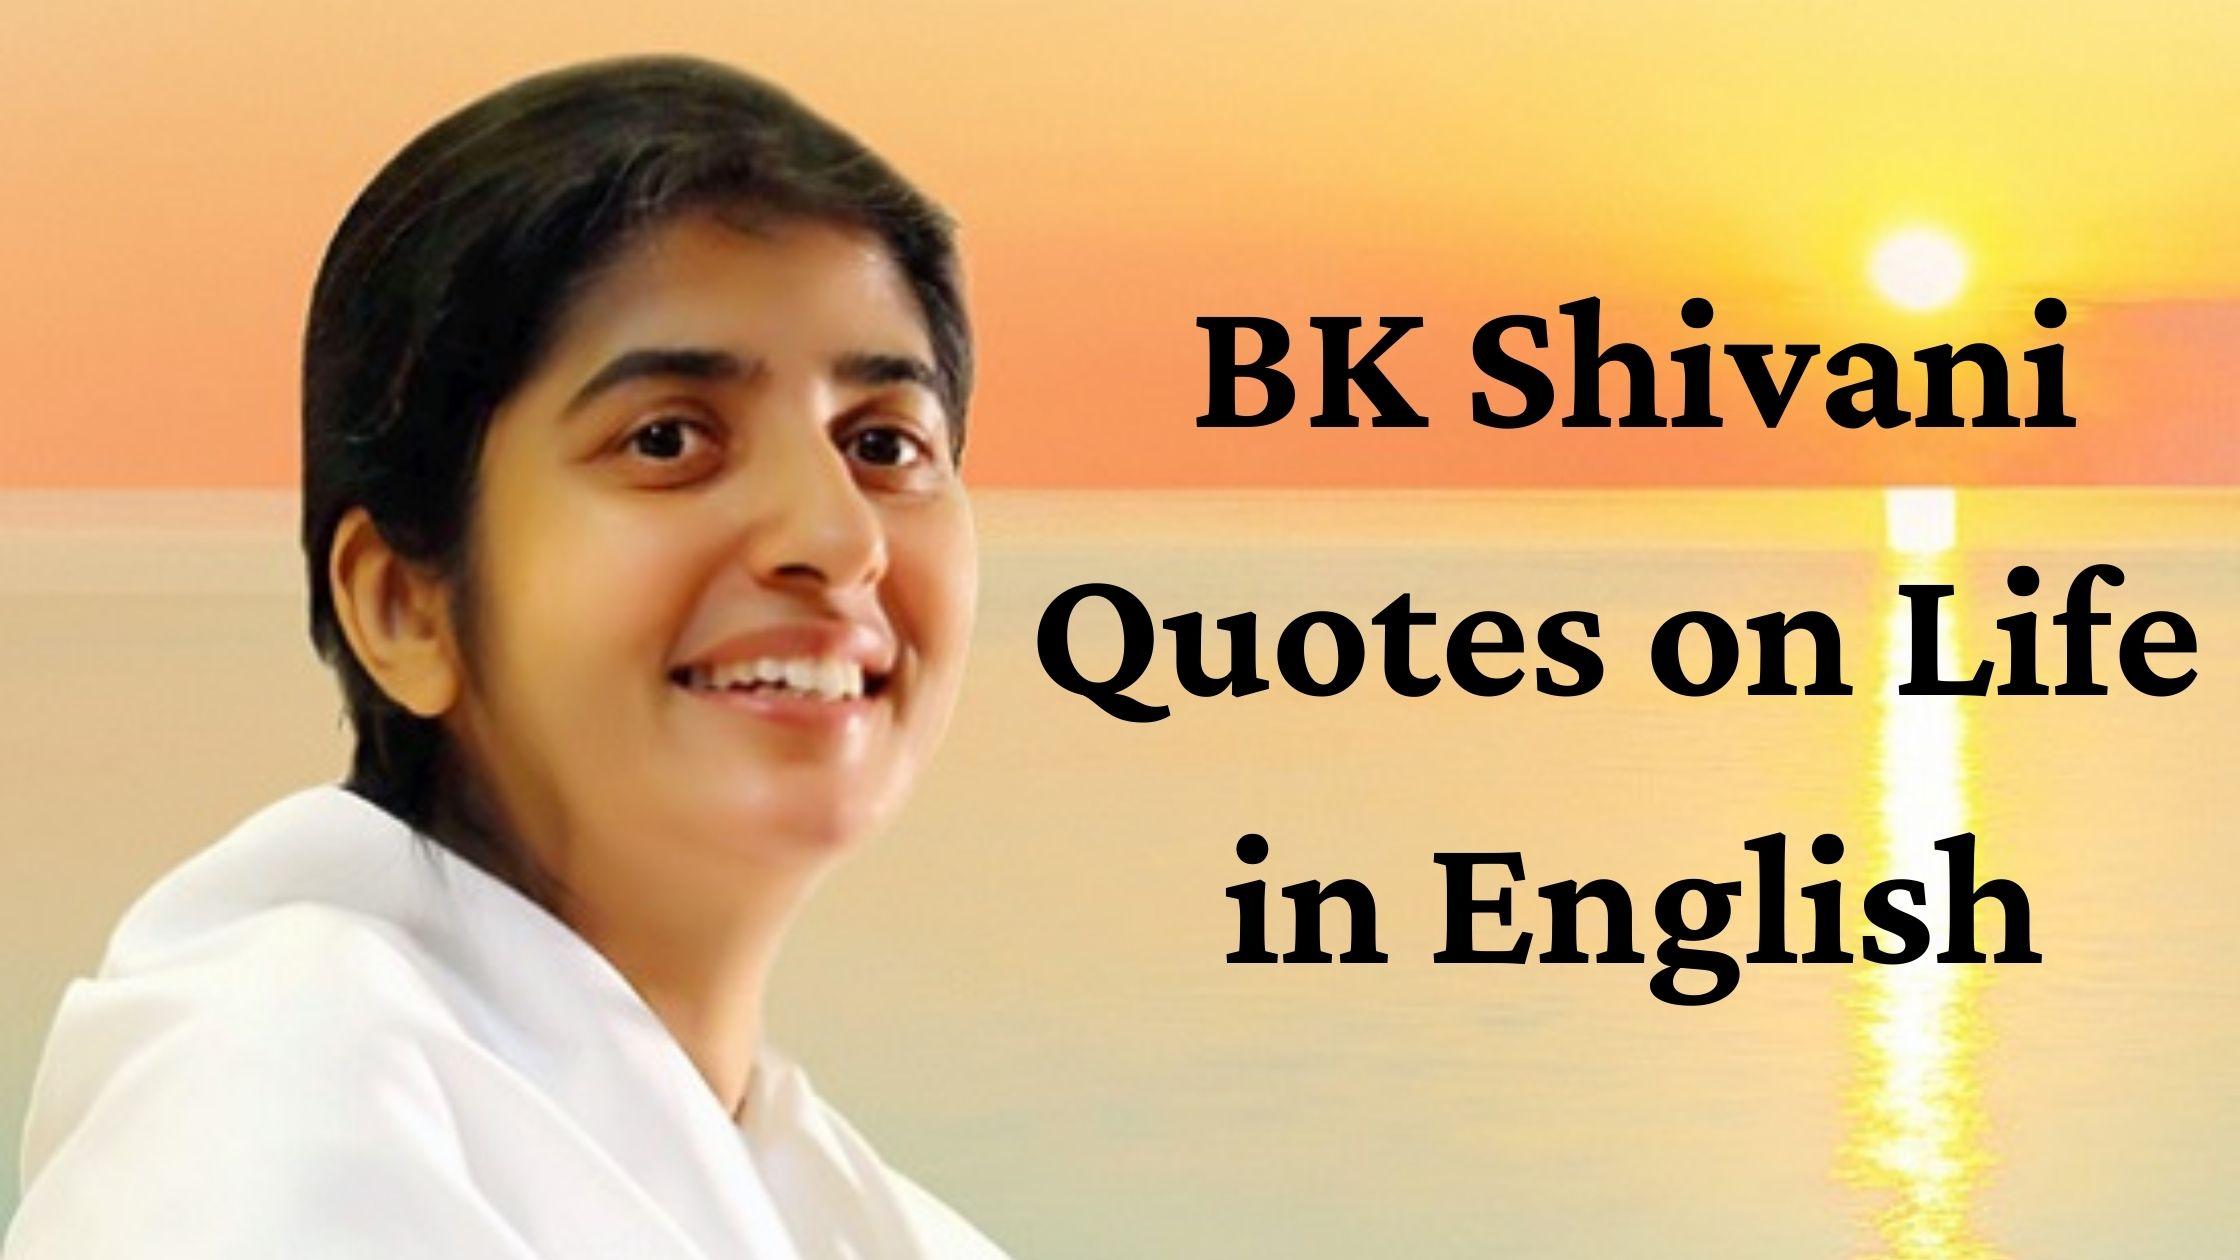 BK Sister Shivani Quotes on Life in English